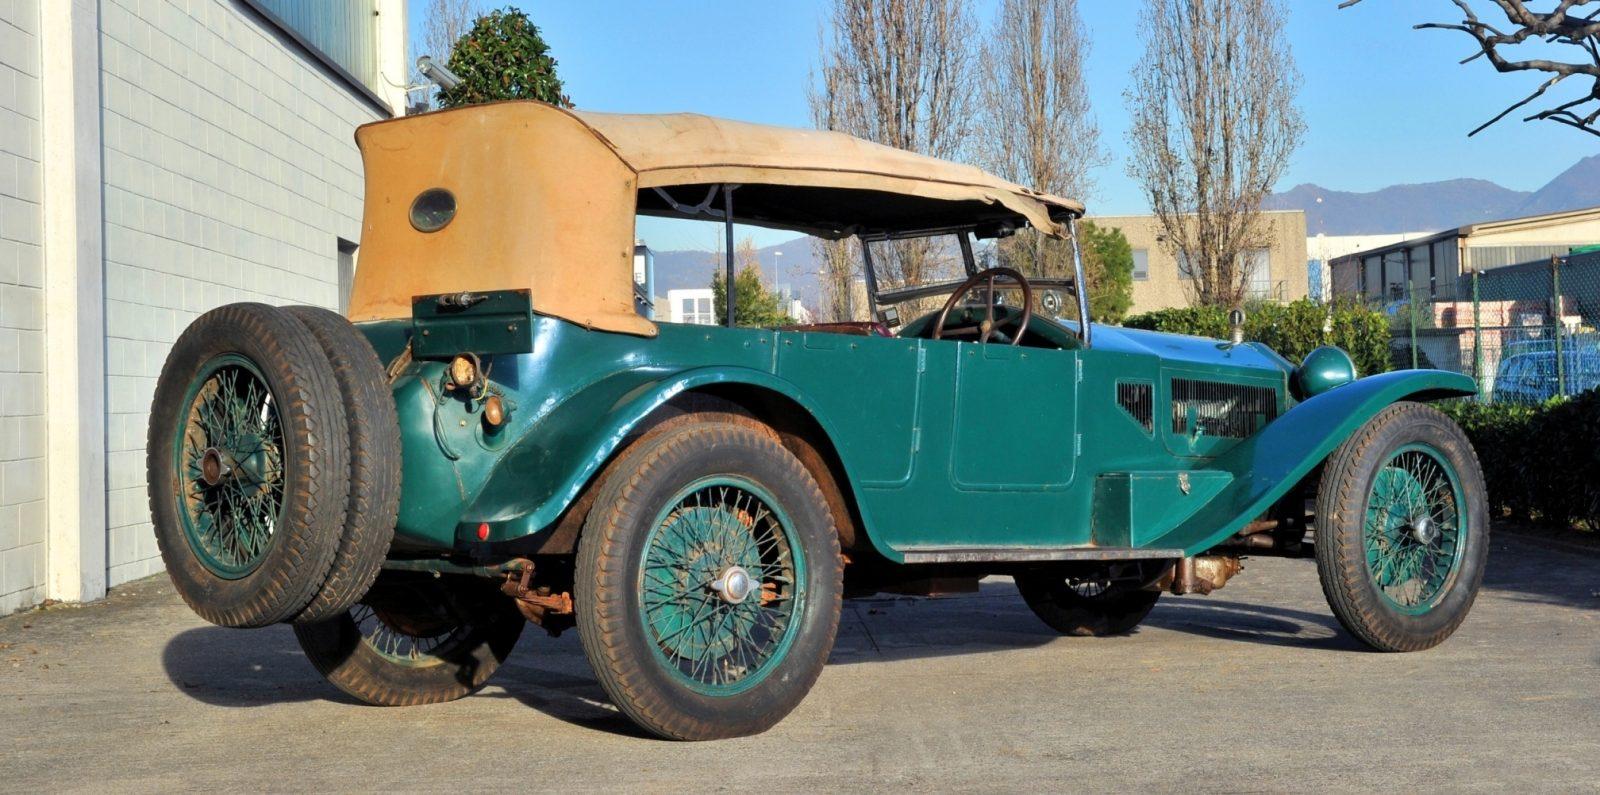 Wealth Dreams -- 1930 Lancia Lambda 8 Sports Tourer Seeks New Home -- My Home 2